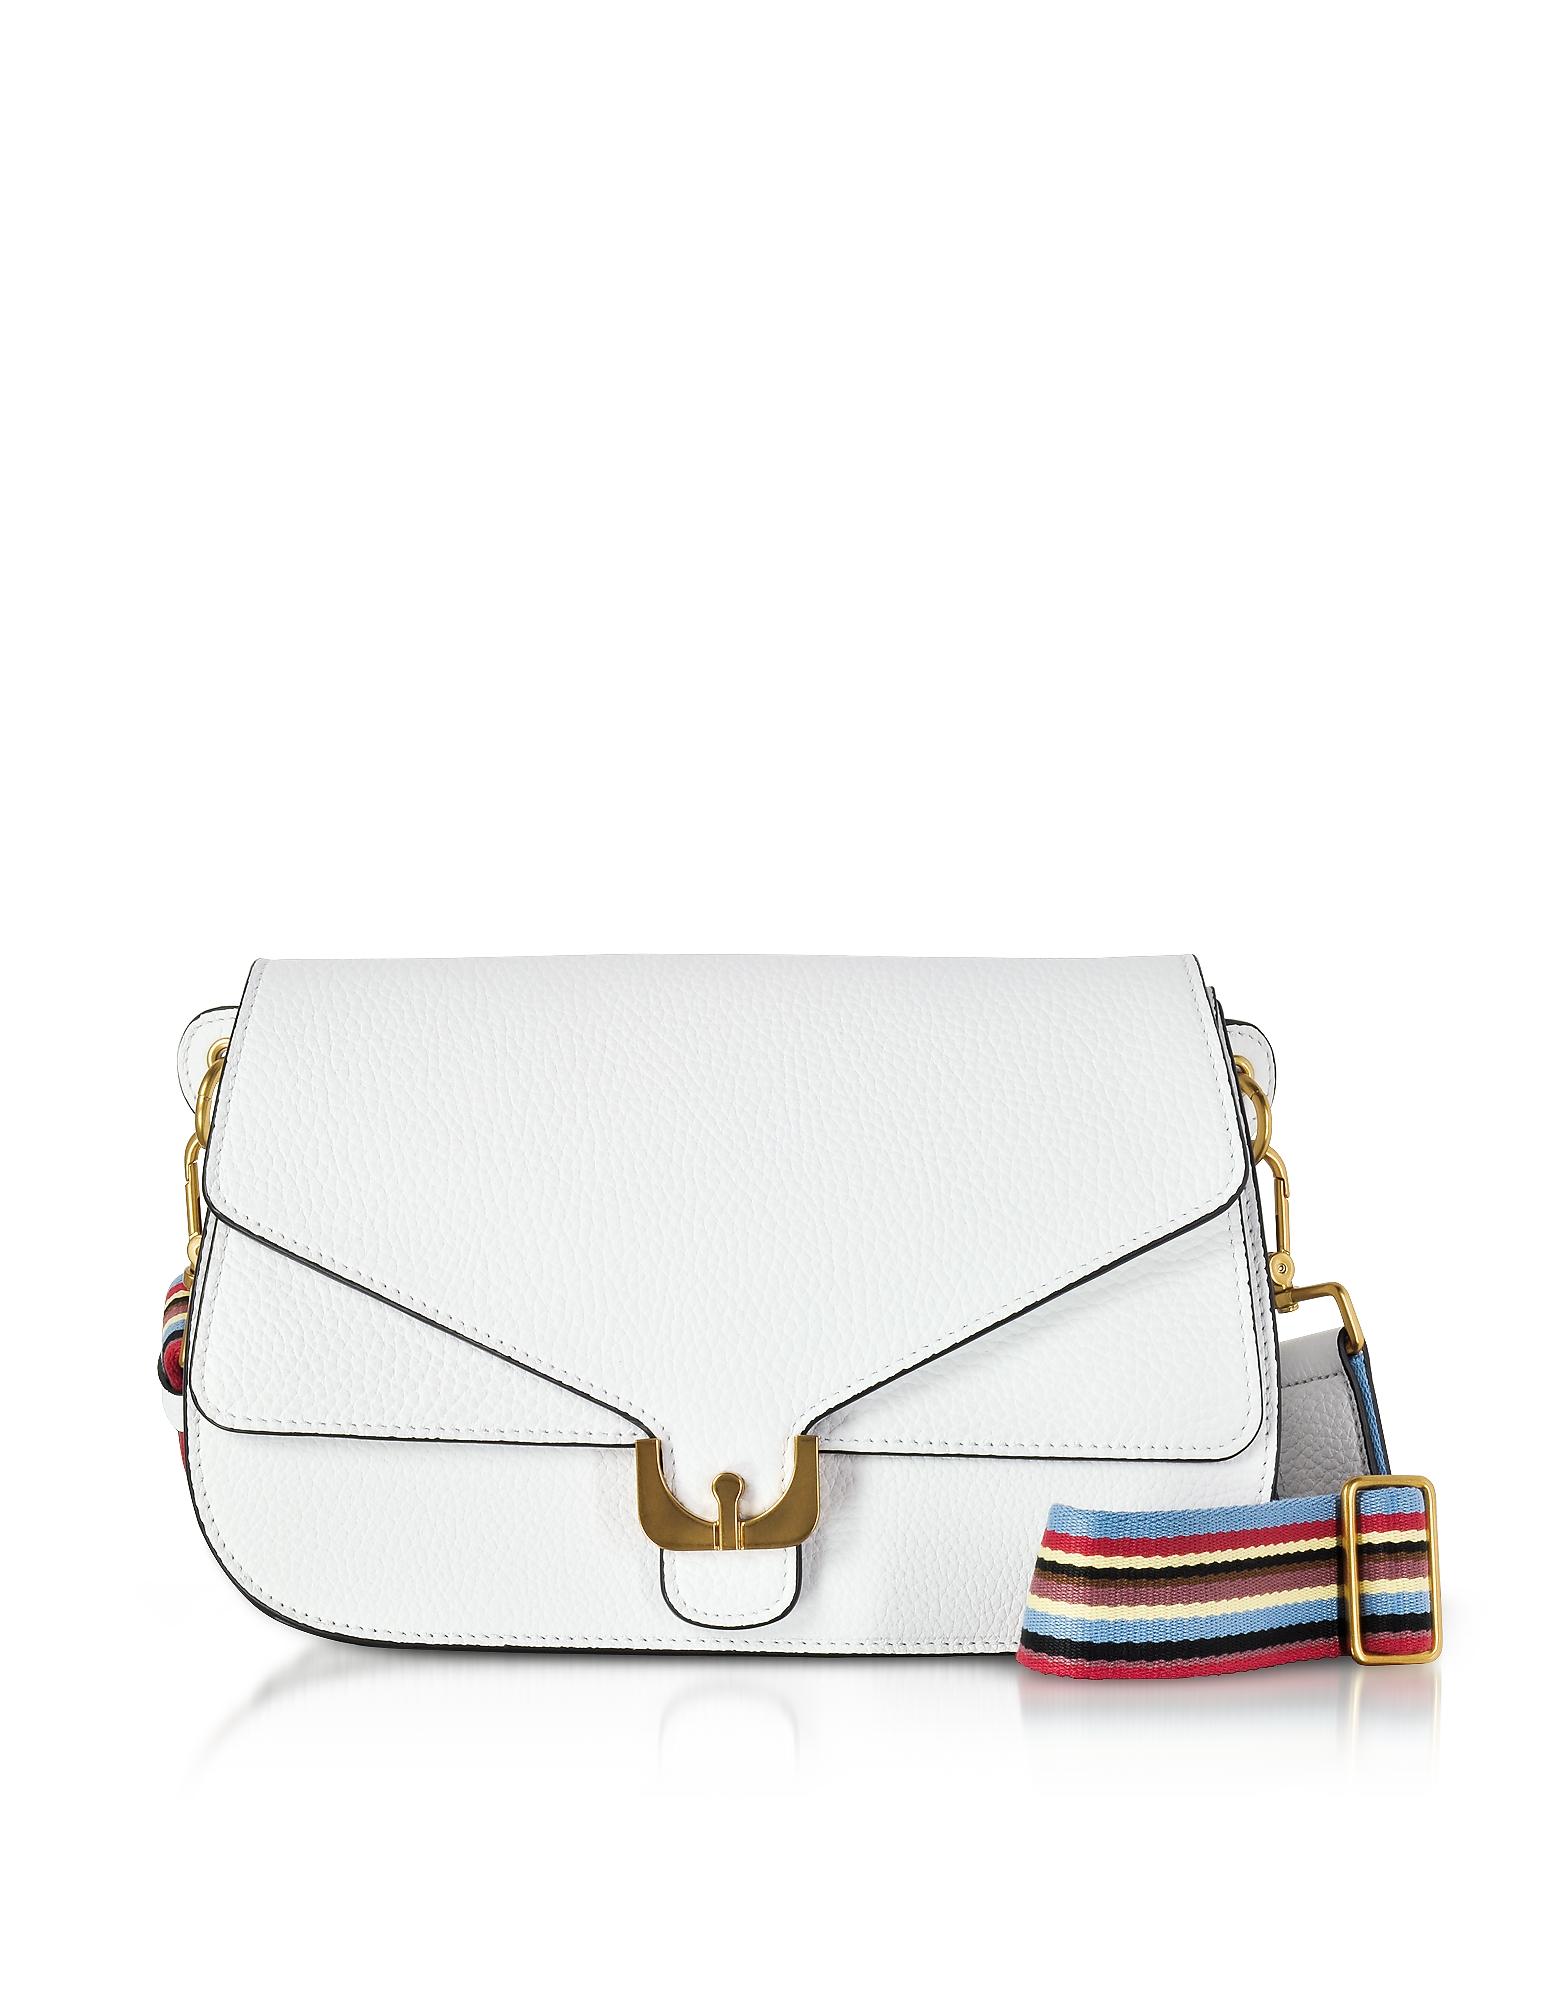 Coccinelle Handbags, White Pebbled Leather Ambrine Rainbow Shoulder Bag